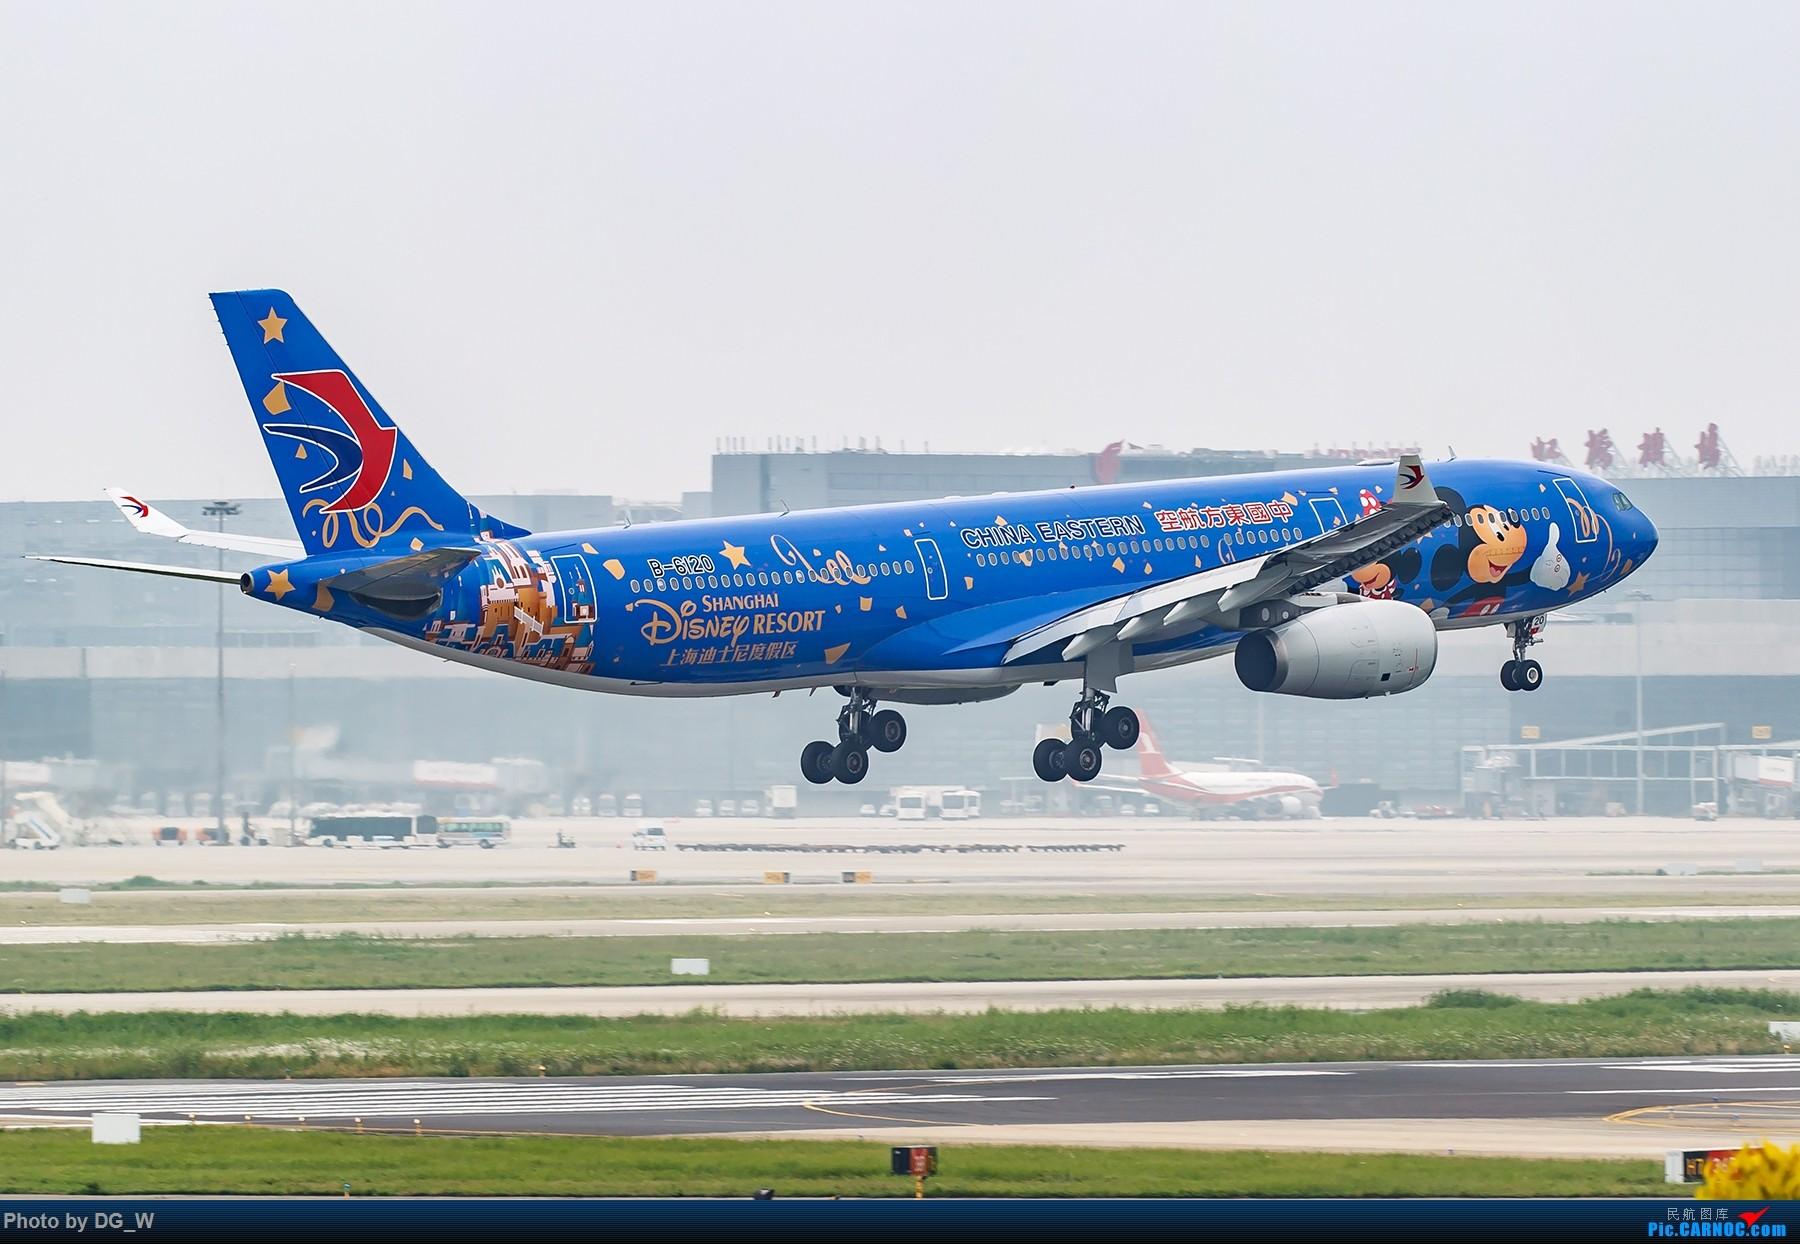 Re:[原创]【南宁飞友】两月之内三次虹桥拍机,大雨中的吹水,水泥天的迪斯尼,晚点的789,不期而遇的ARJ AIRBUS A330-300 B-6120 中国上海虹桥国际机场